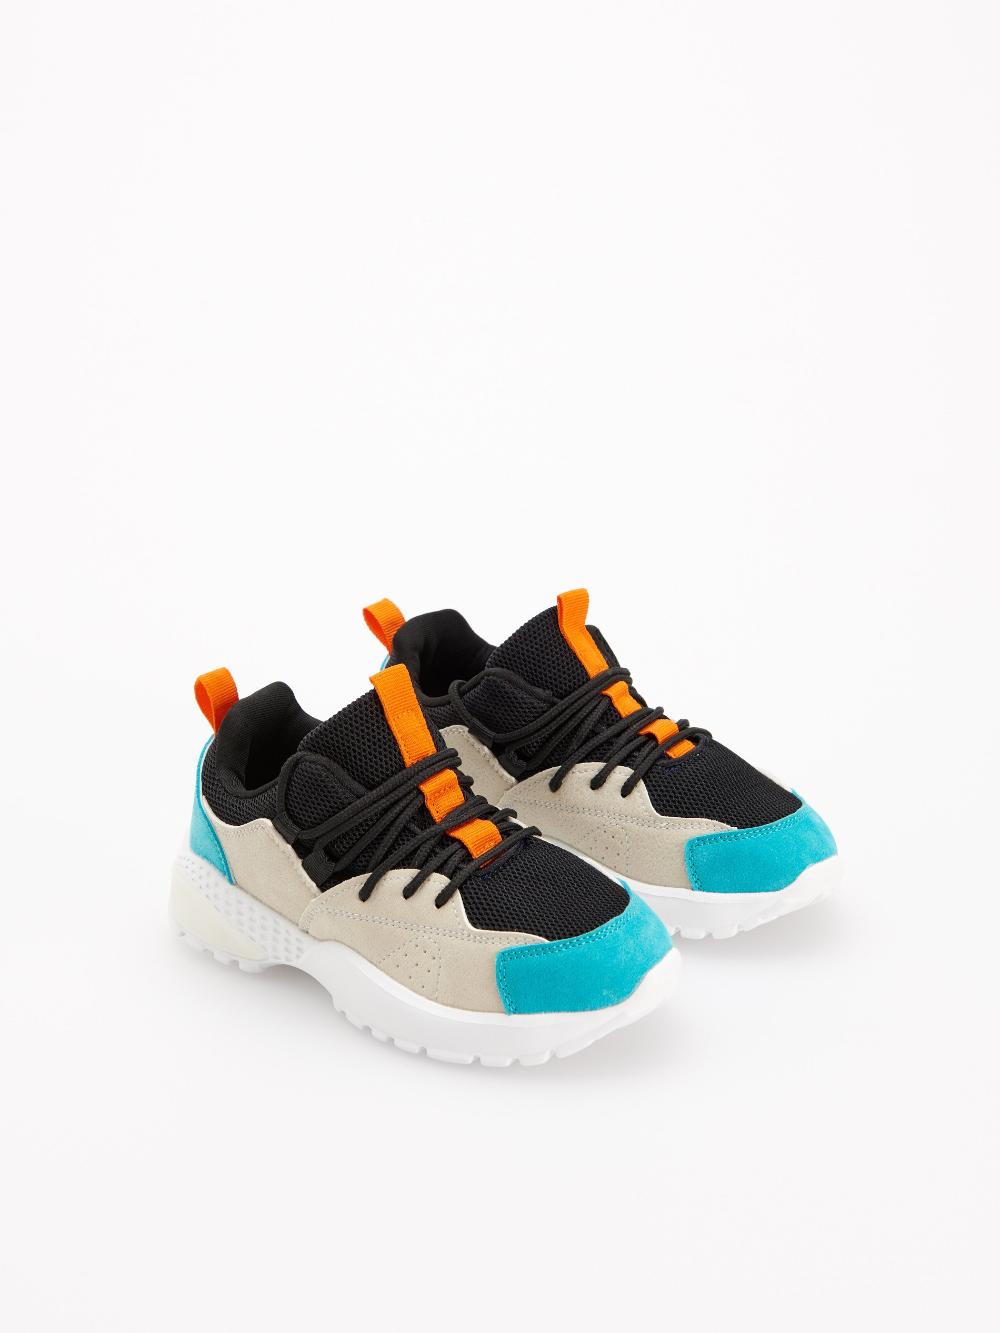 Kupuj Online Buty W Sportowym Stylu Reserved Wo080 Mlc Sneakers Nike Sports Shoes Shoes